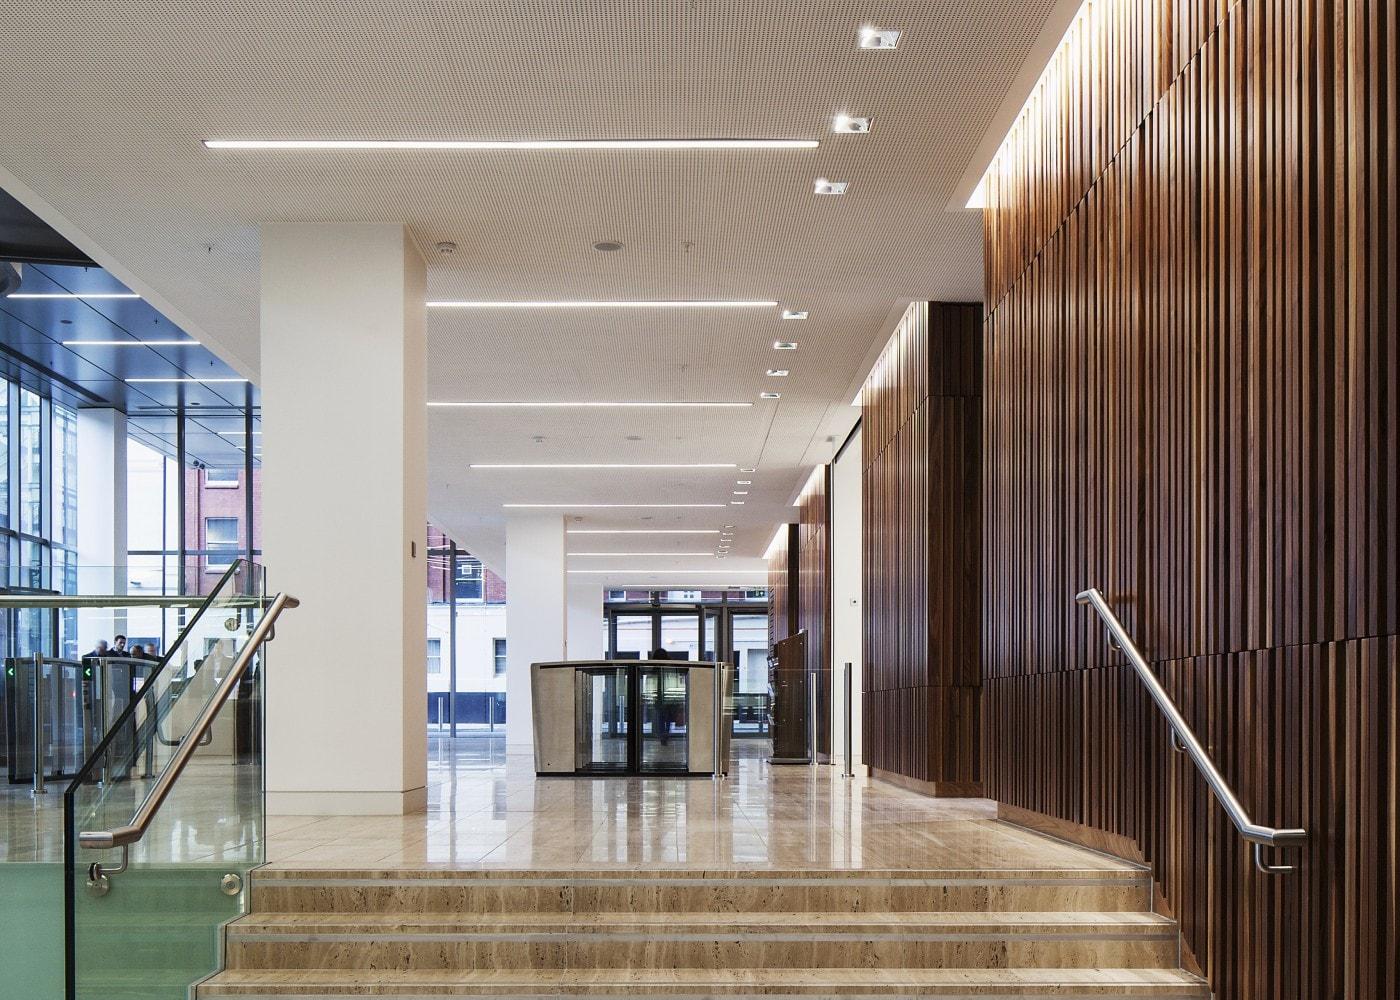 retail lighting design: One Spinningfields stairway